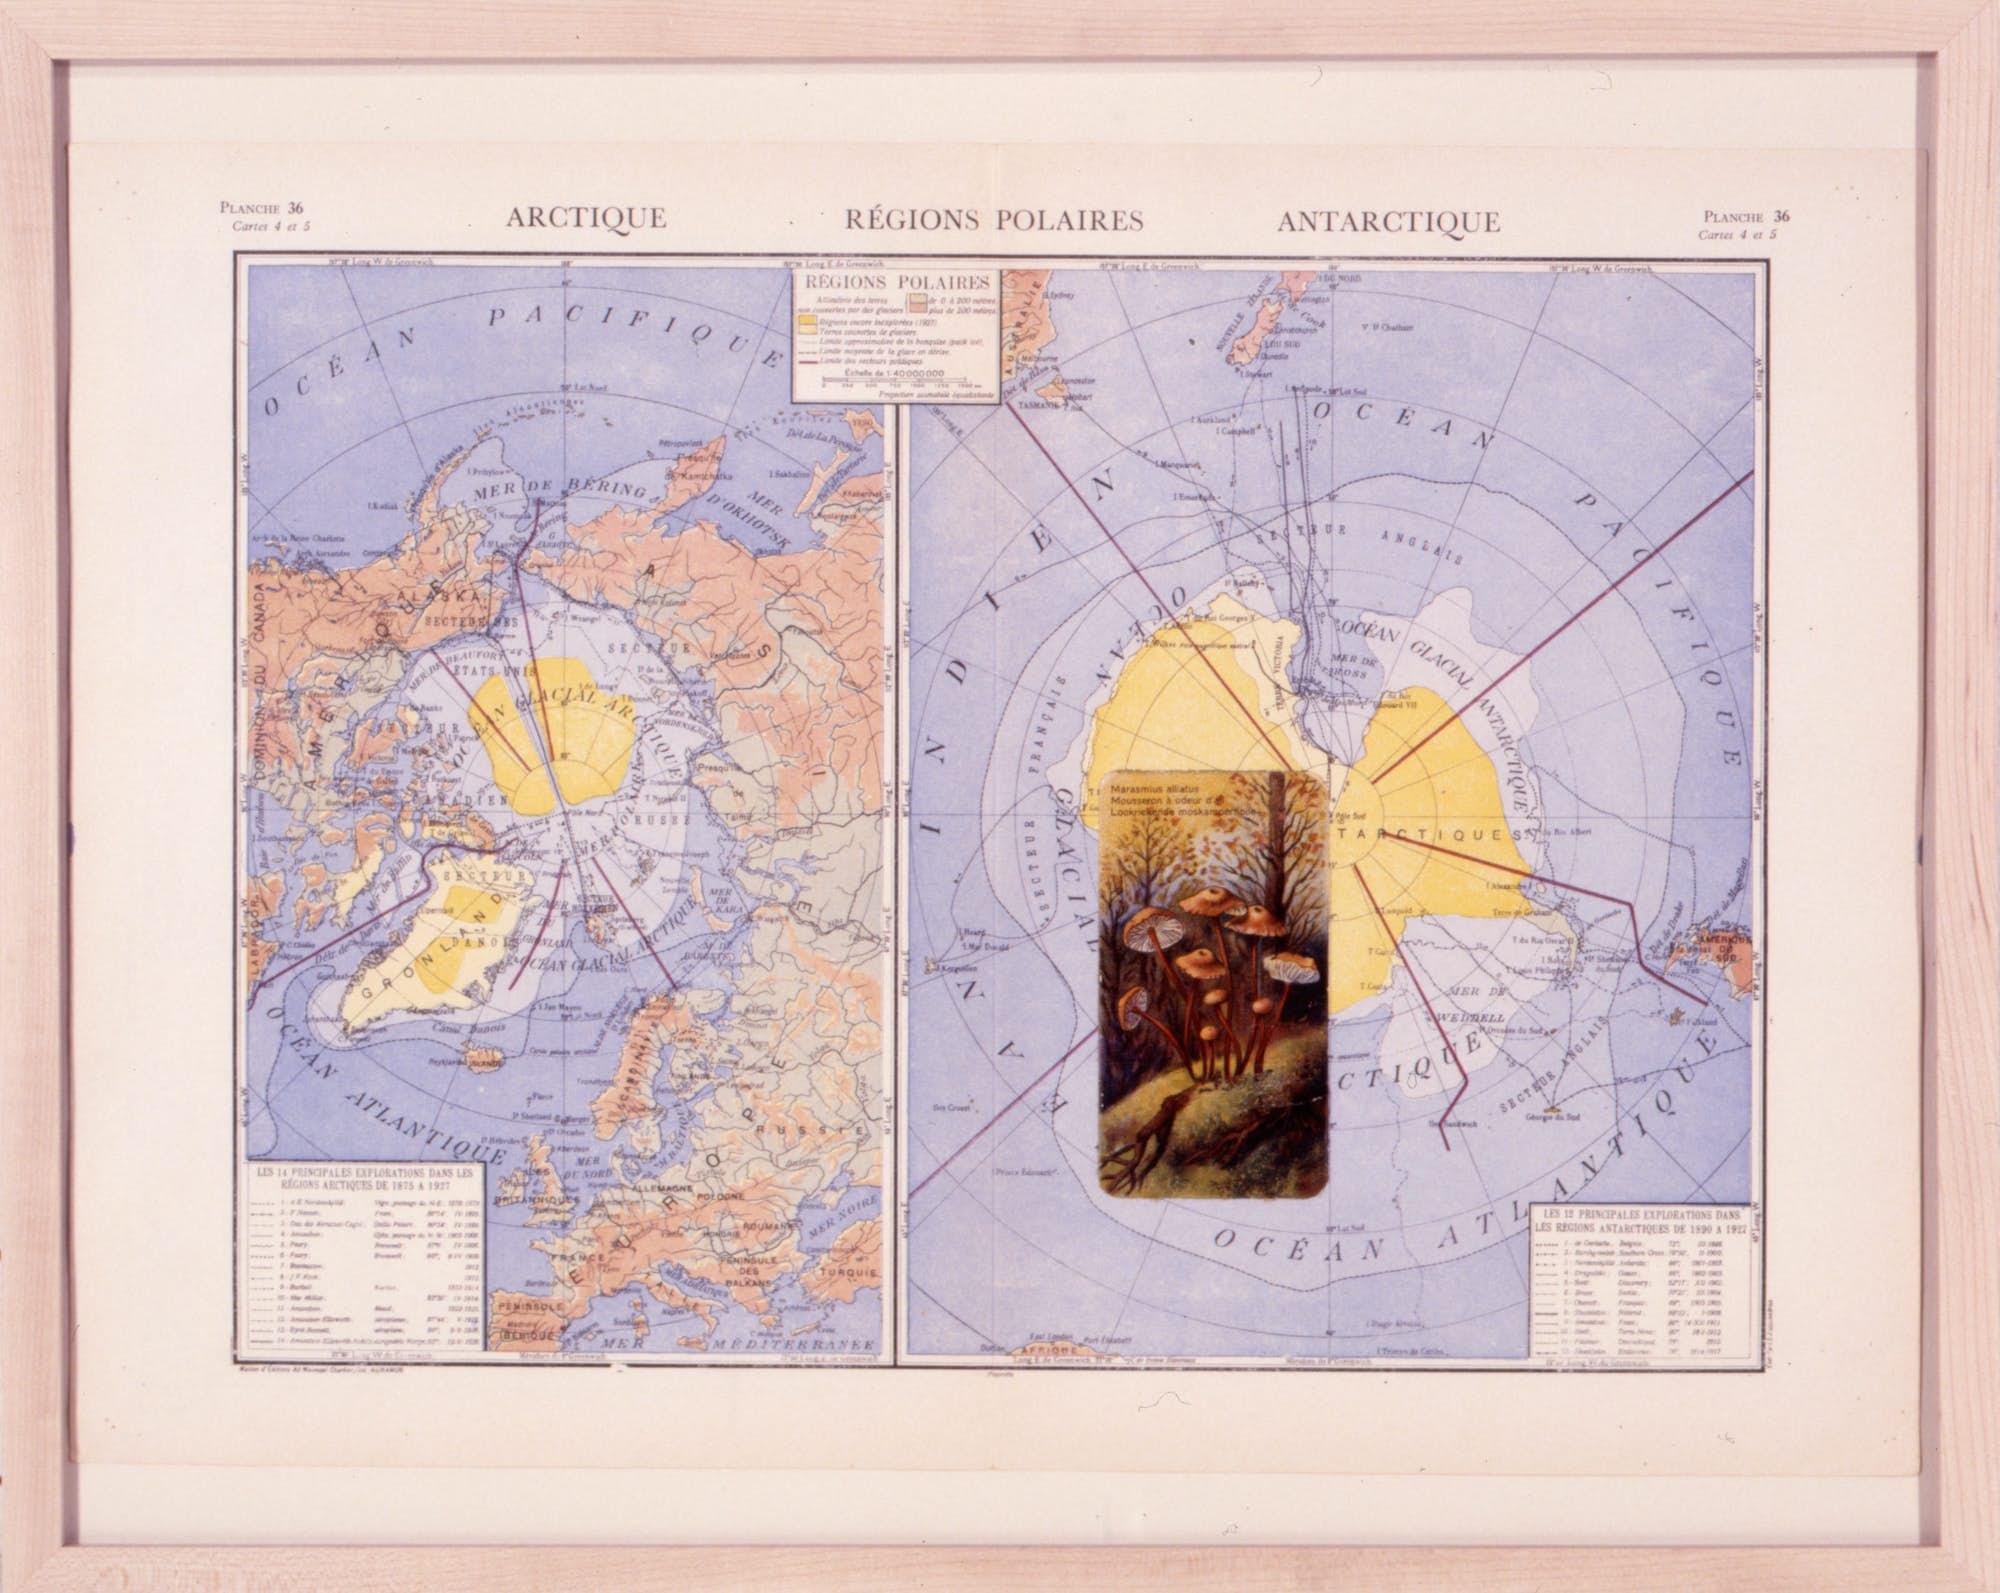 Thierry Tillier Atlas Botanica 3